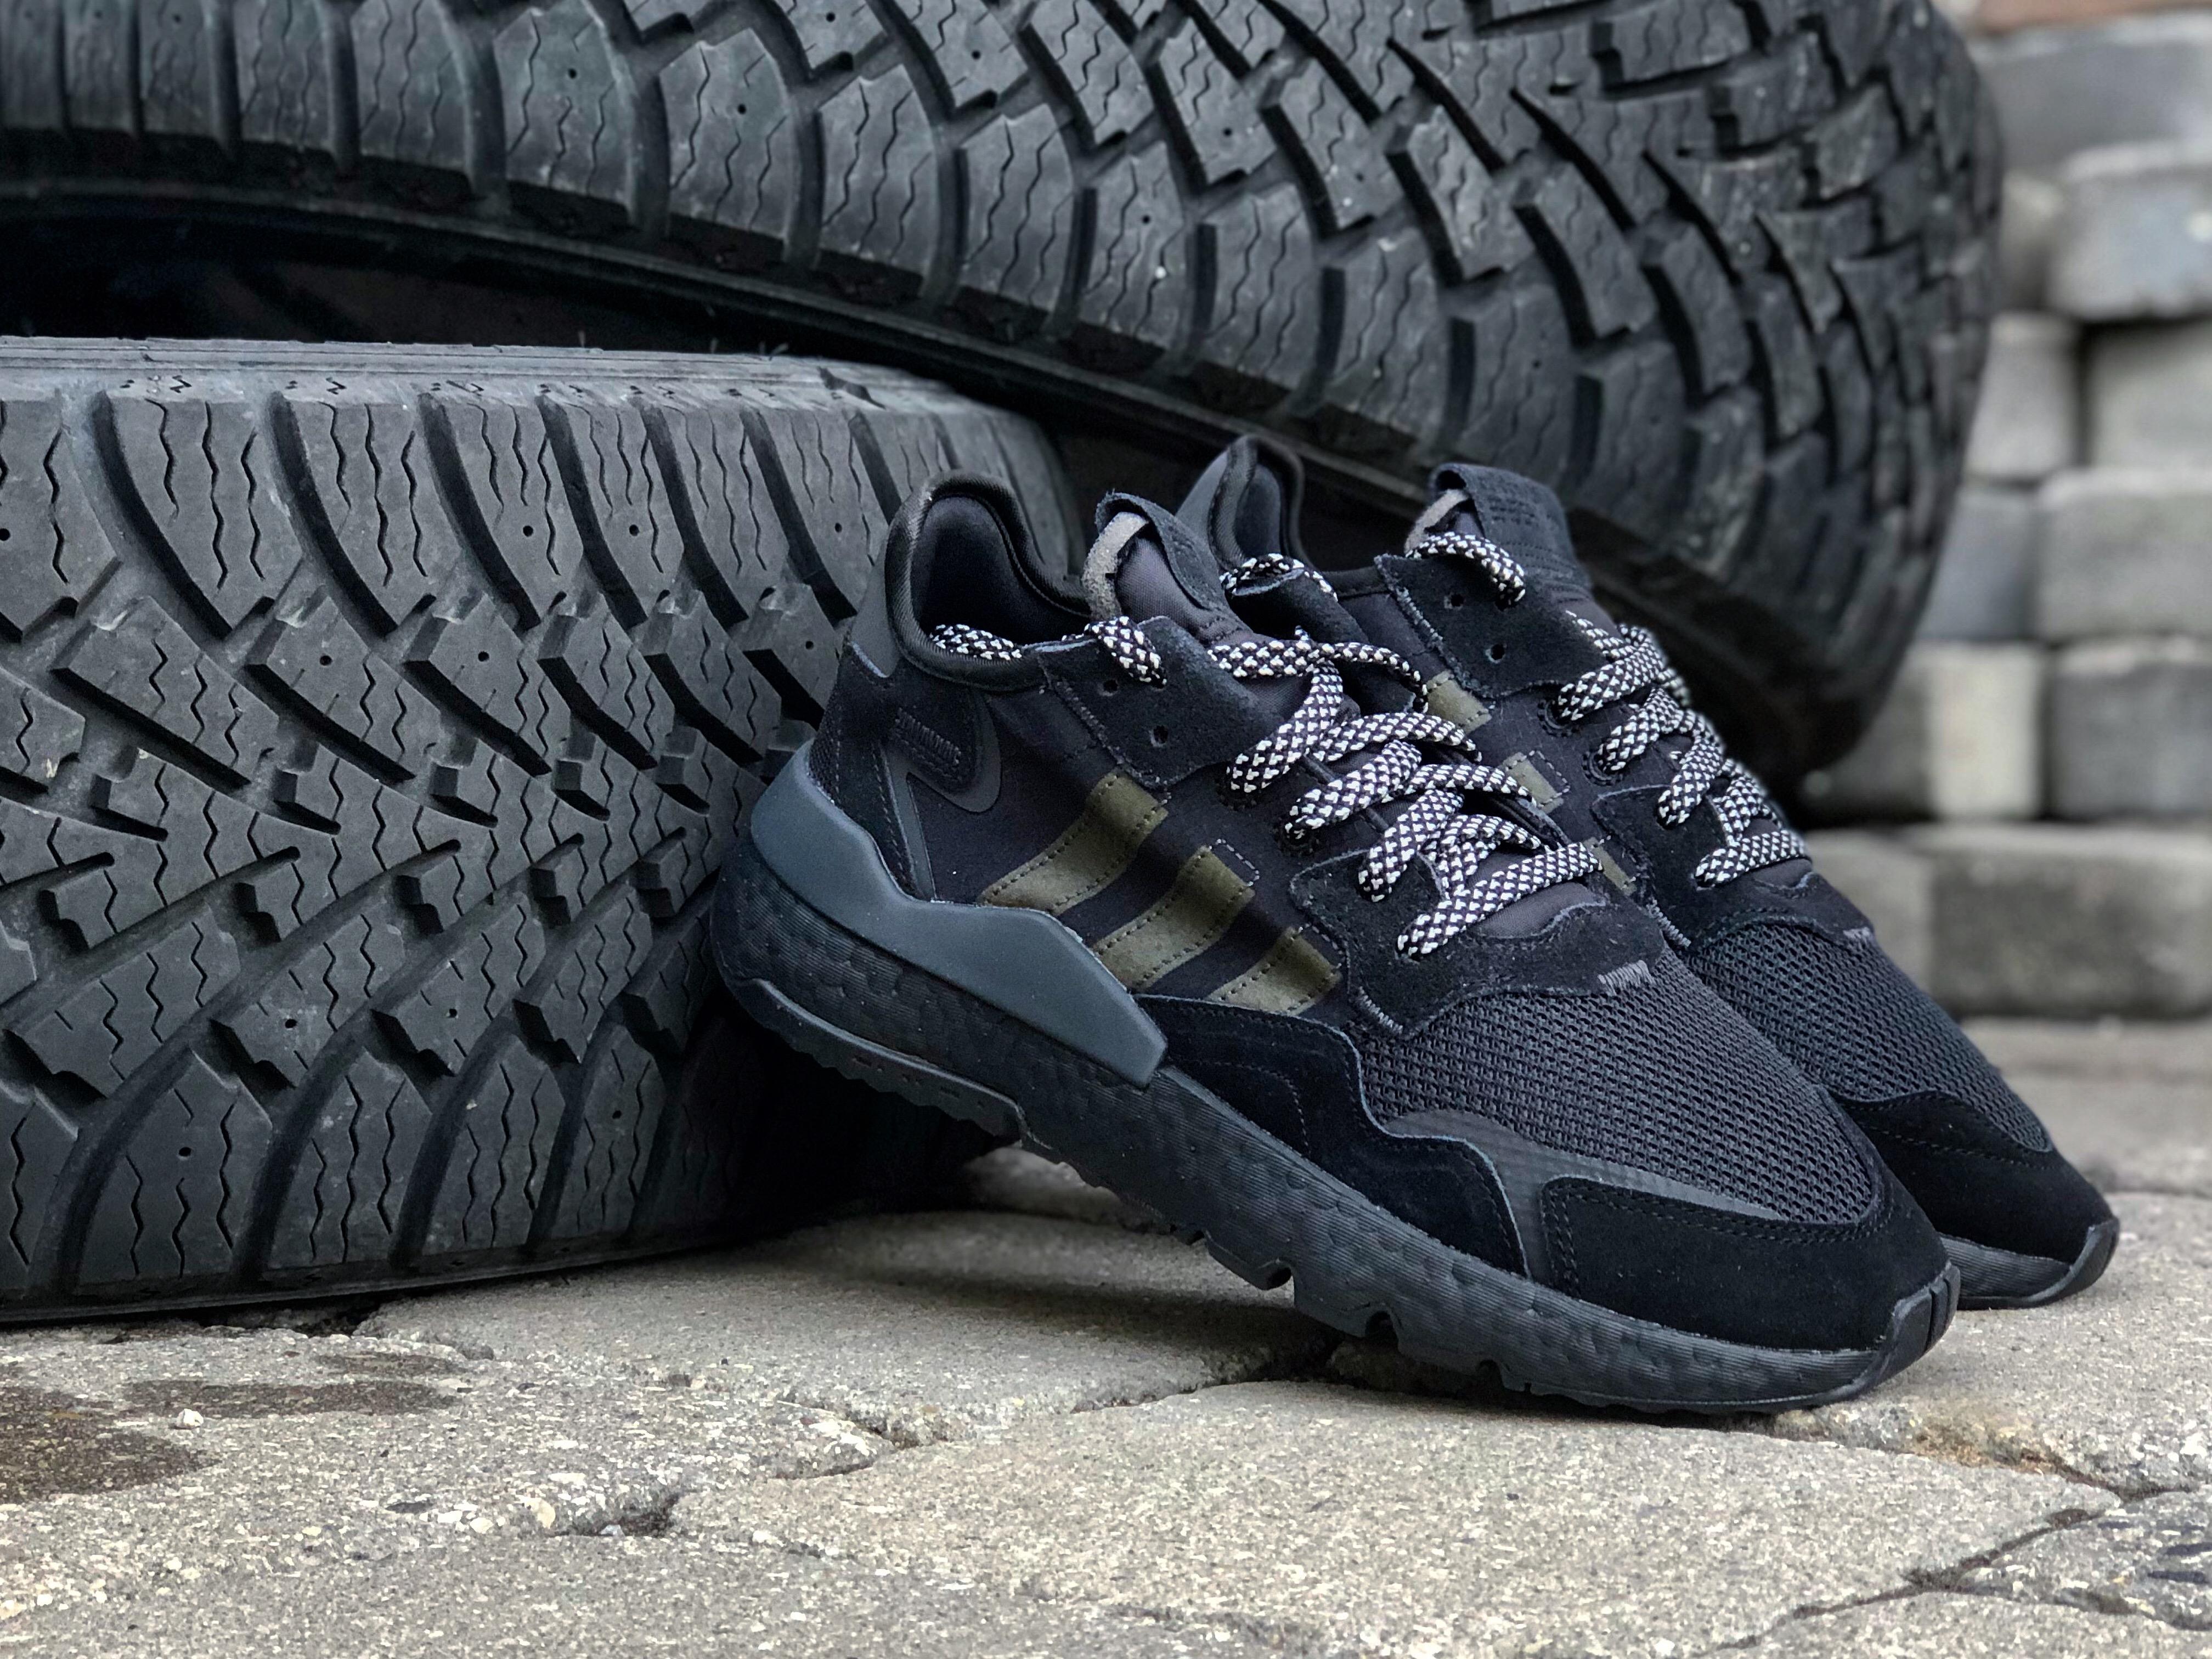 Adidas Nite Jogger – Canada Sole Got oedxCB